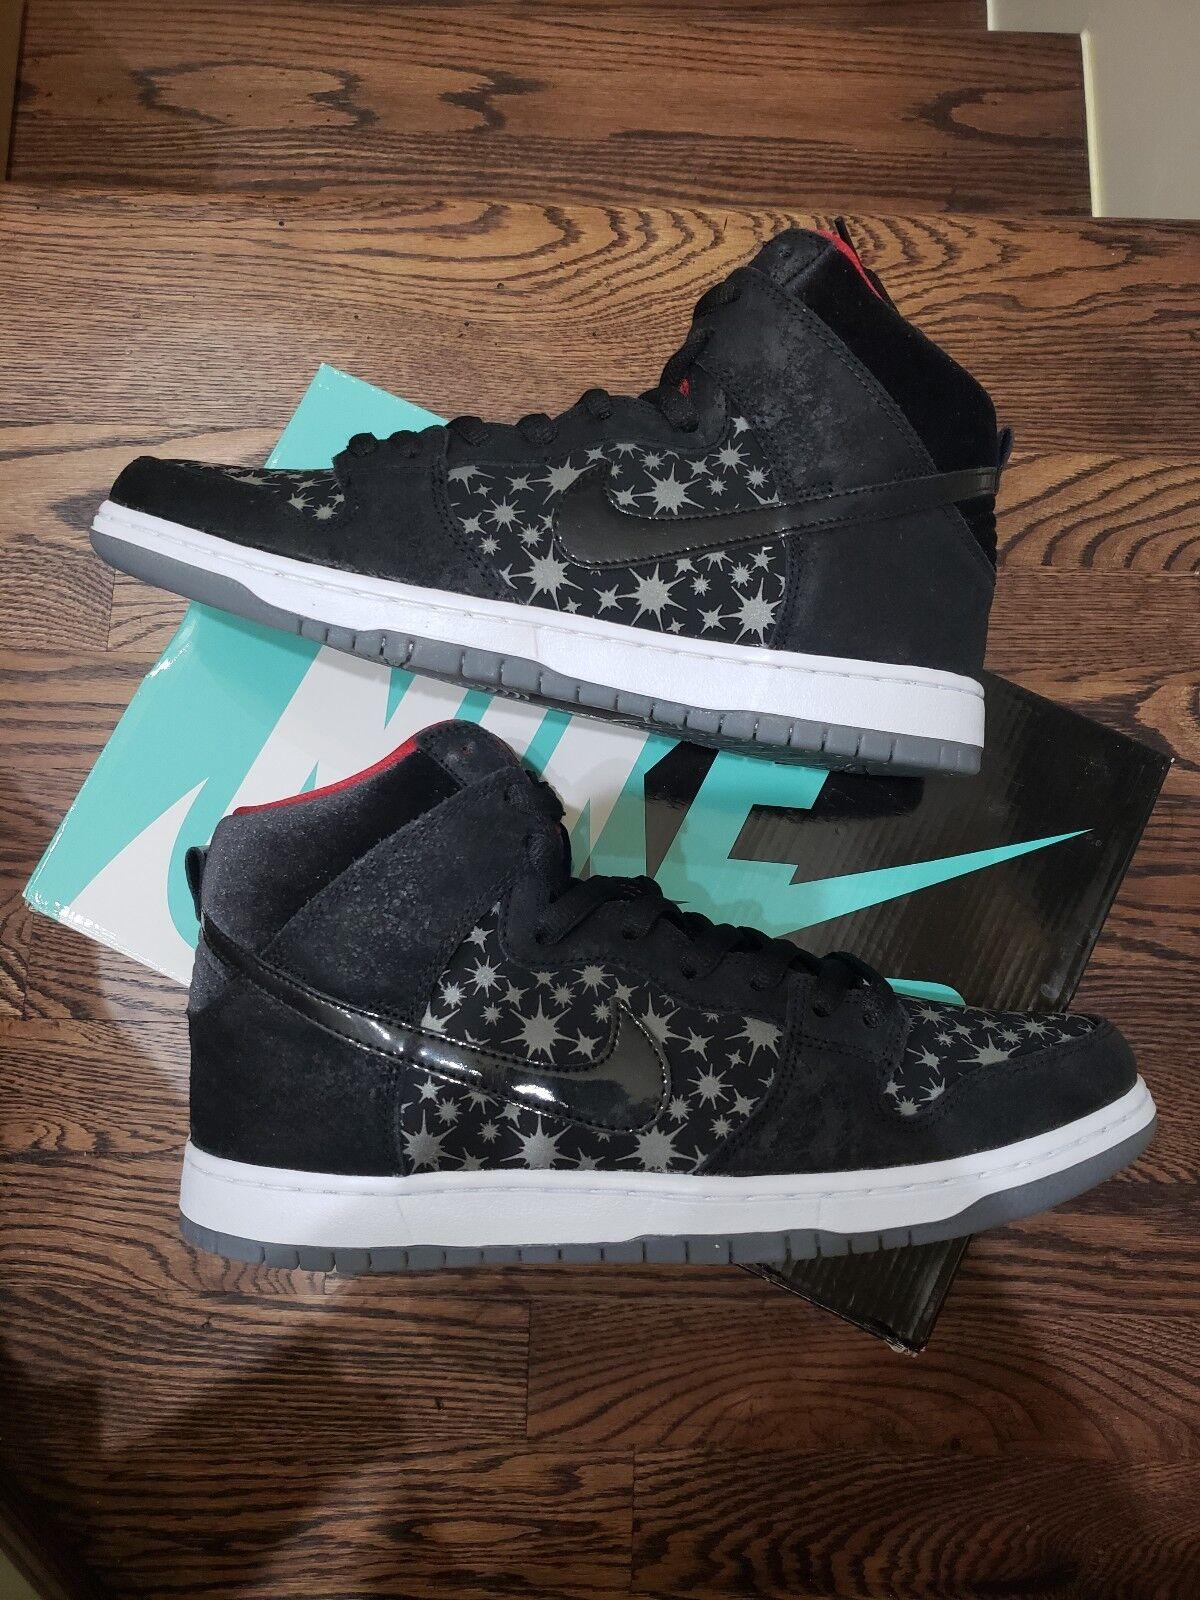 Nike Dunk High Premium SB Paparazzi Pro Brooklyn Projects size 11 deadstock new